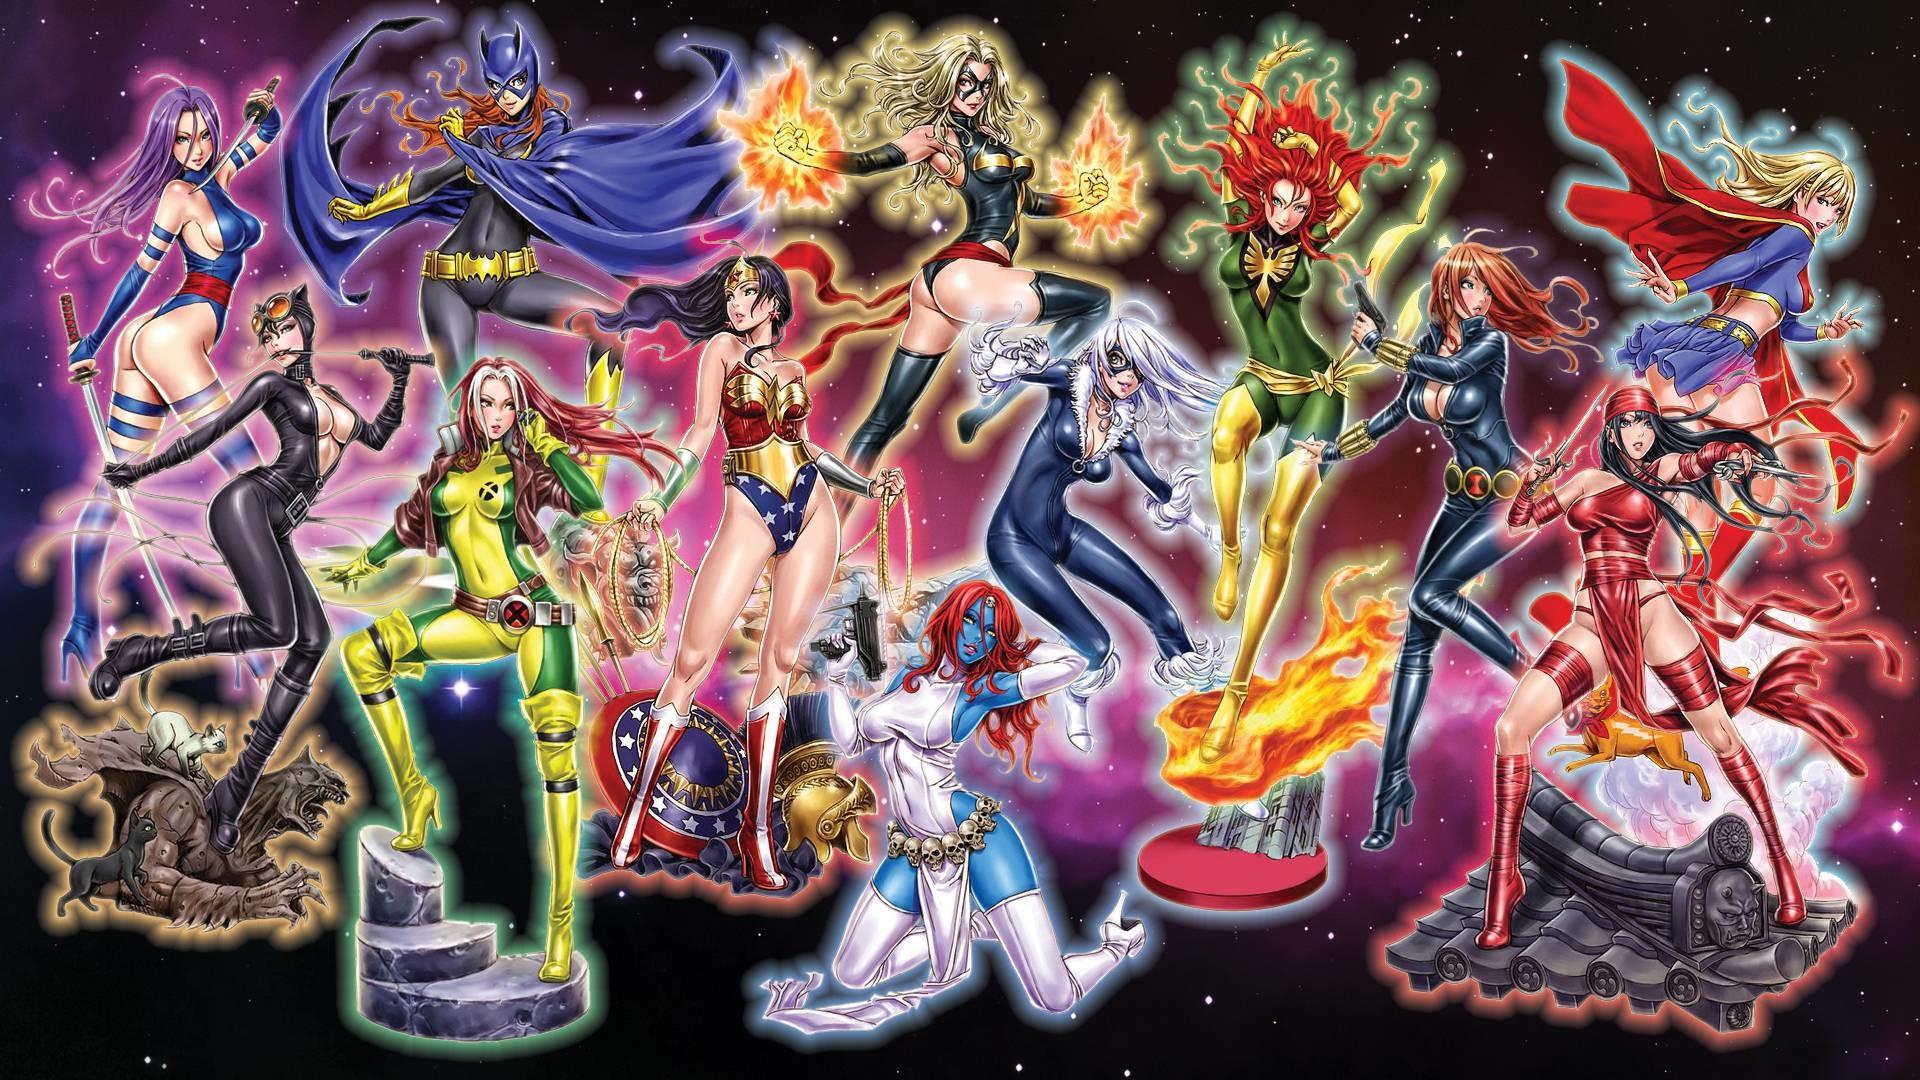 Marvel vs Dc by songoku223 on Wallpaper   Hot HD Wallpaper